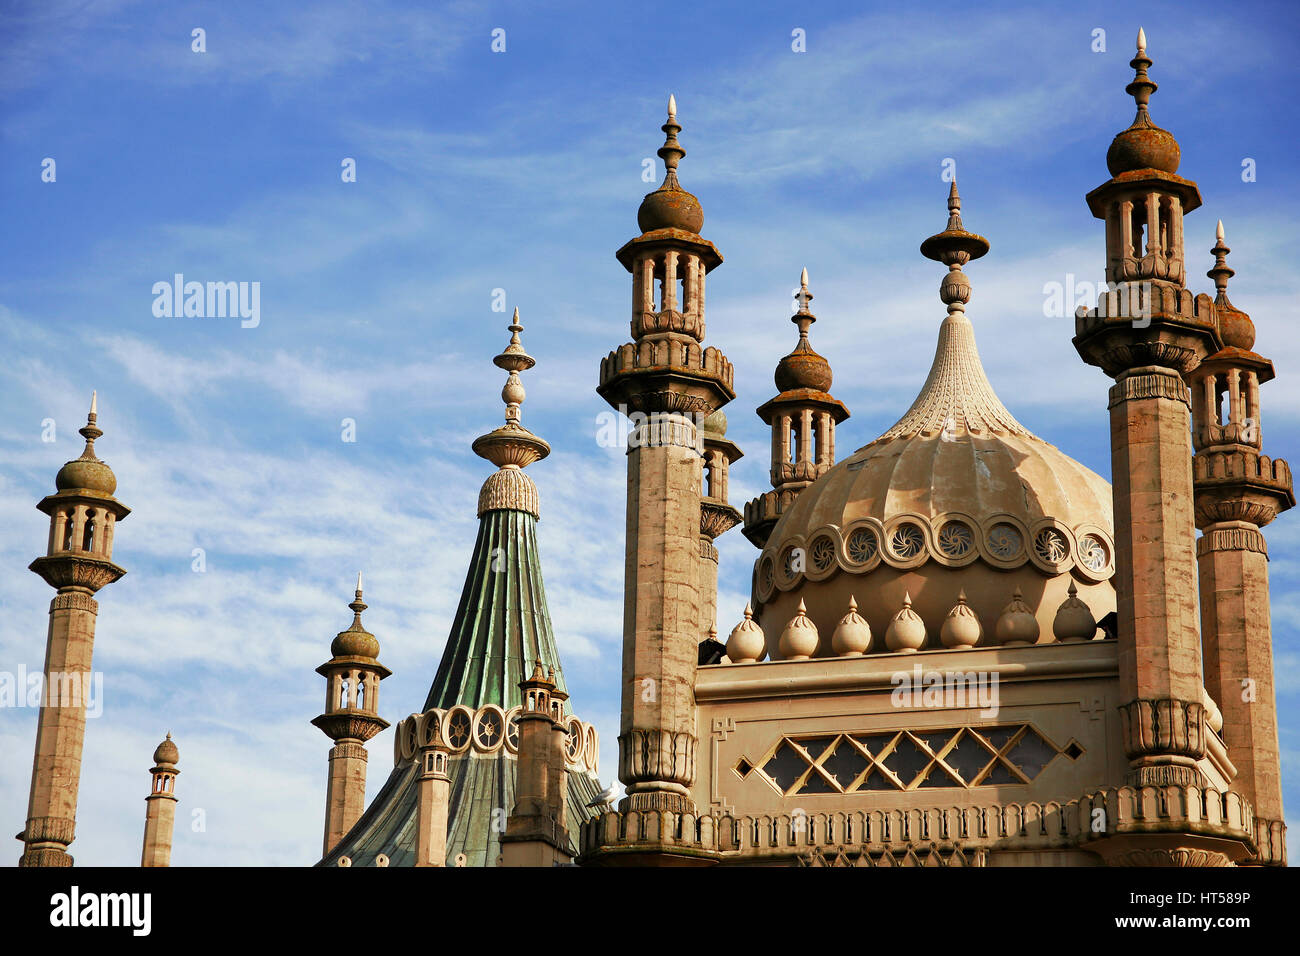 Royal Pavilion Brighton Sussex UK - Stock Image